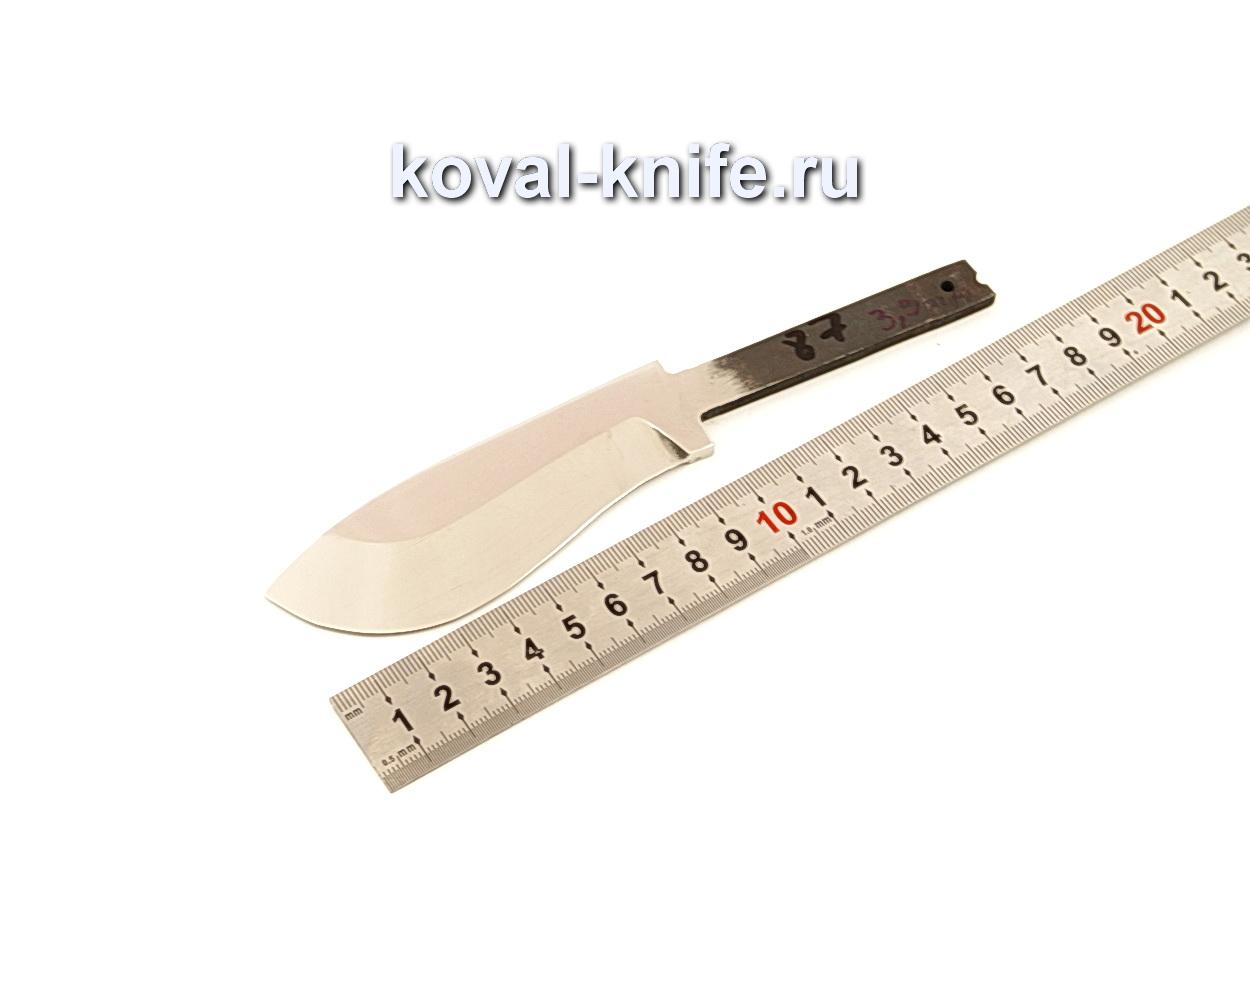 Клинок для ножа из кованой стали Х12МФ N87